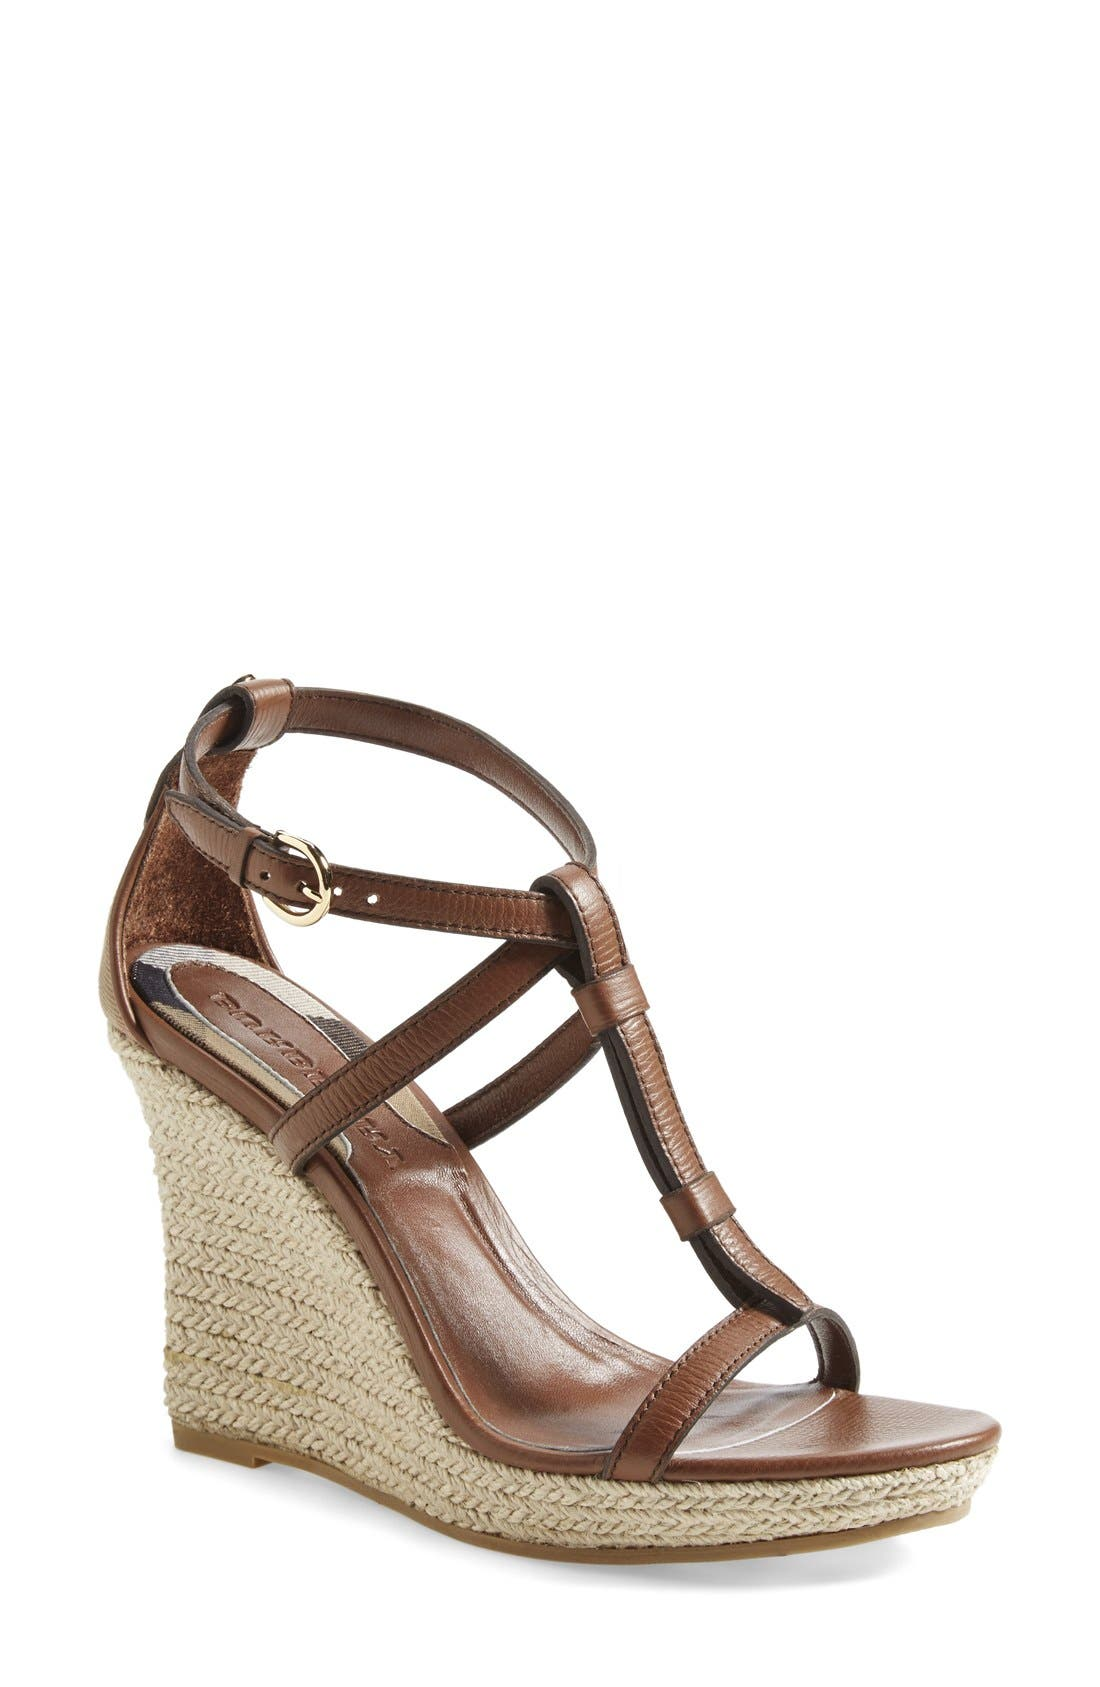 Main Image - Burberry 'Wedland' Espadrille Wedge Sandal (Women)